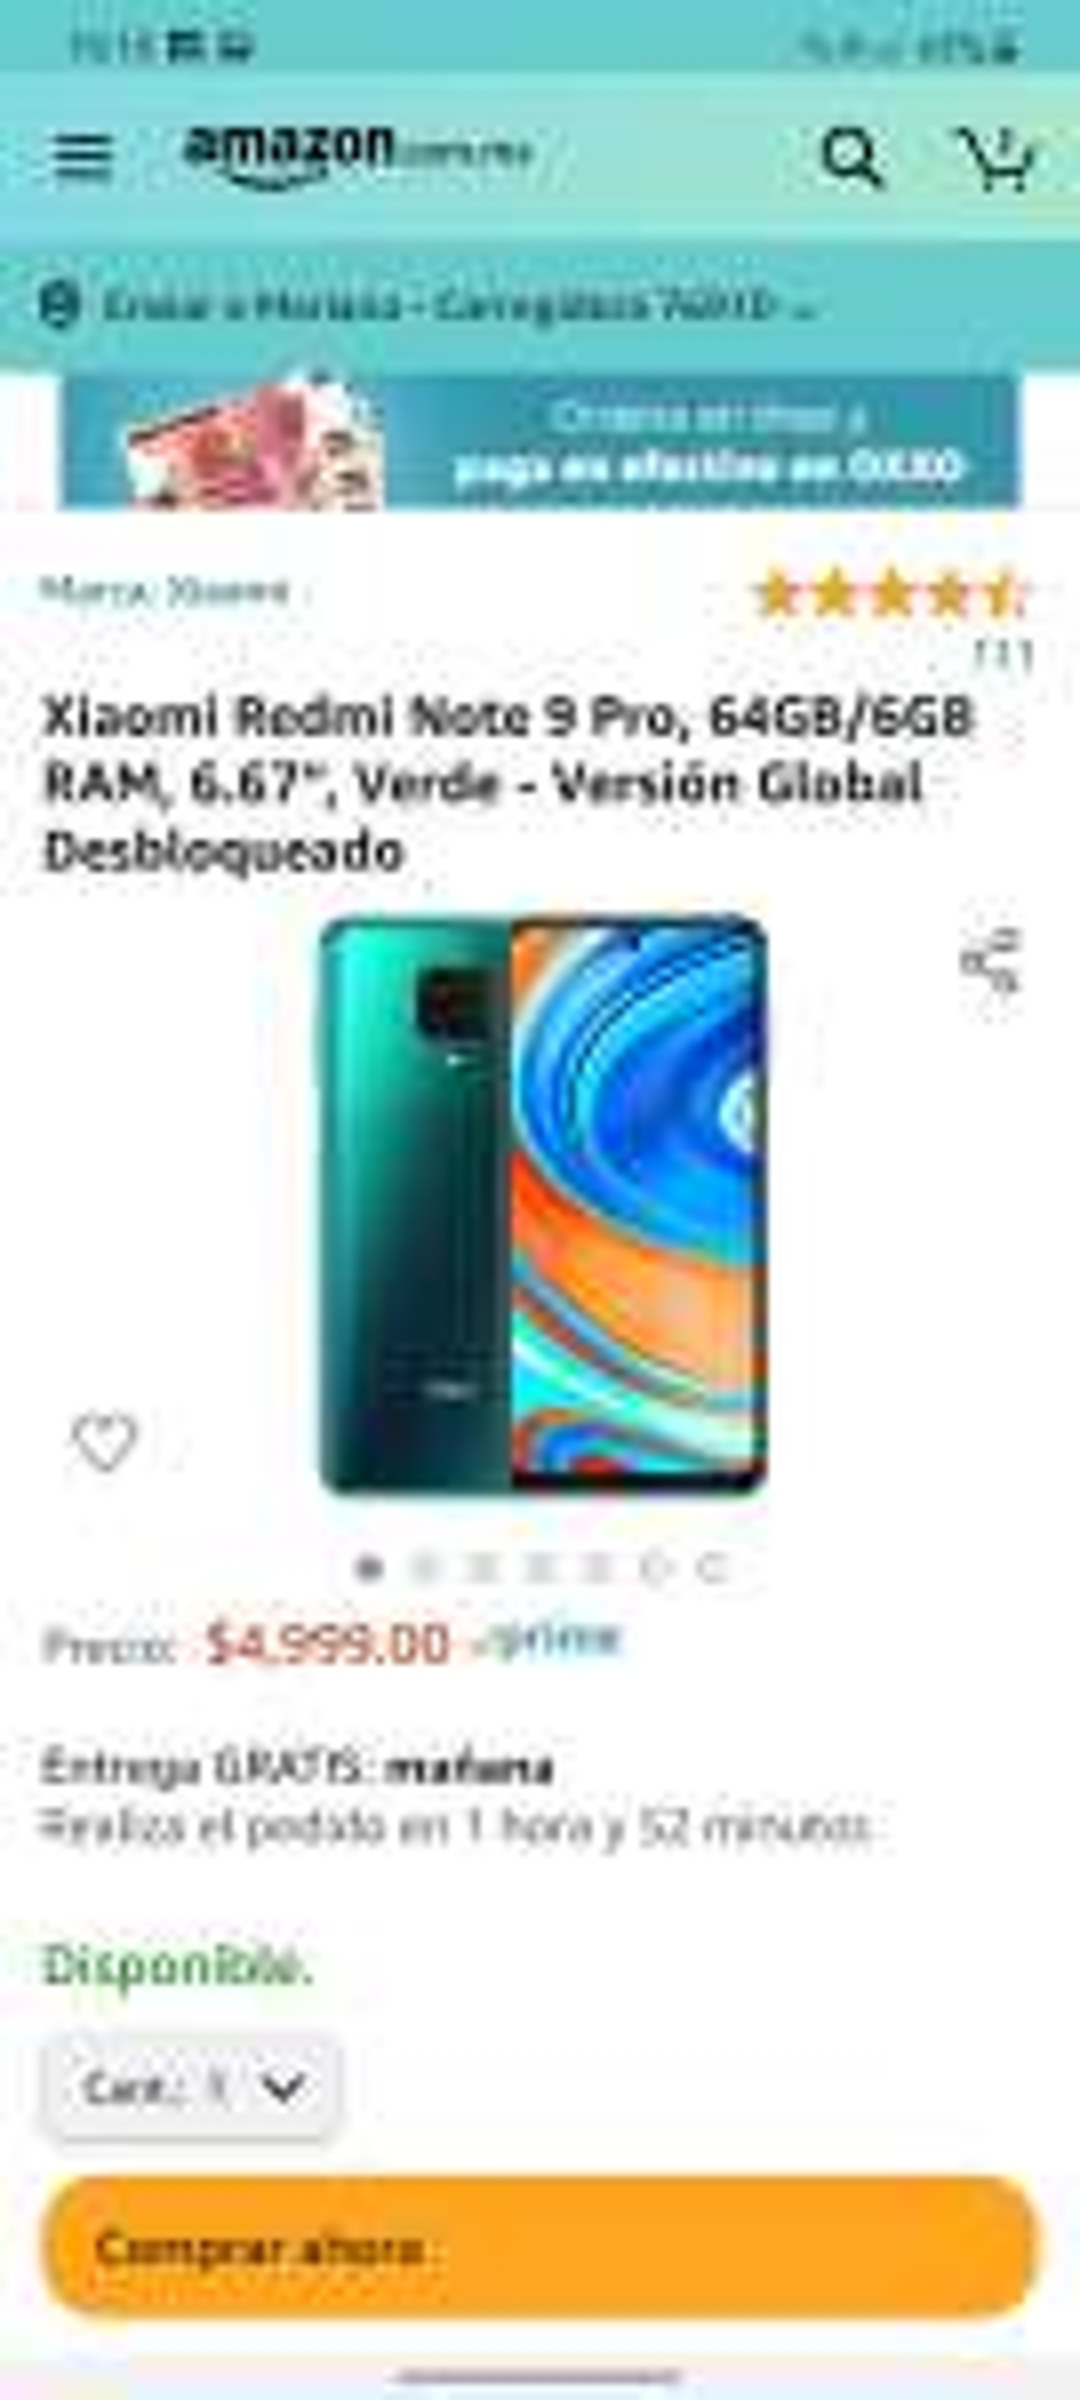 Aazon: Redmi note 9 pro